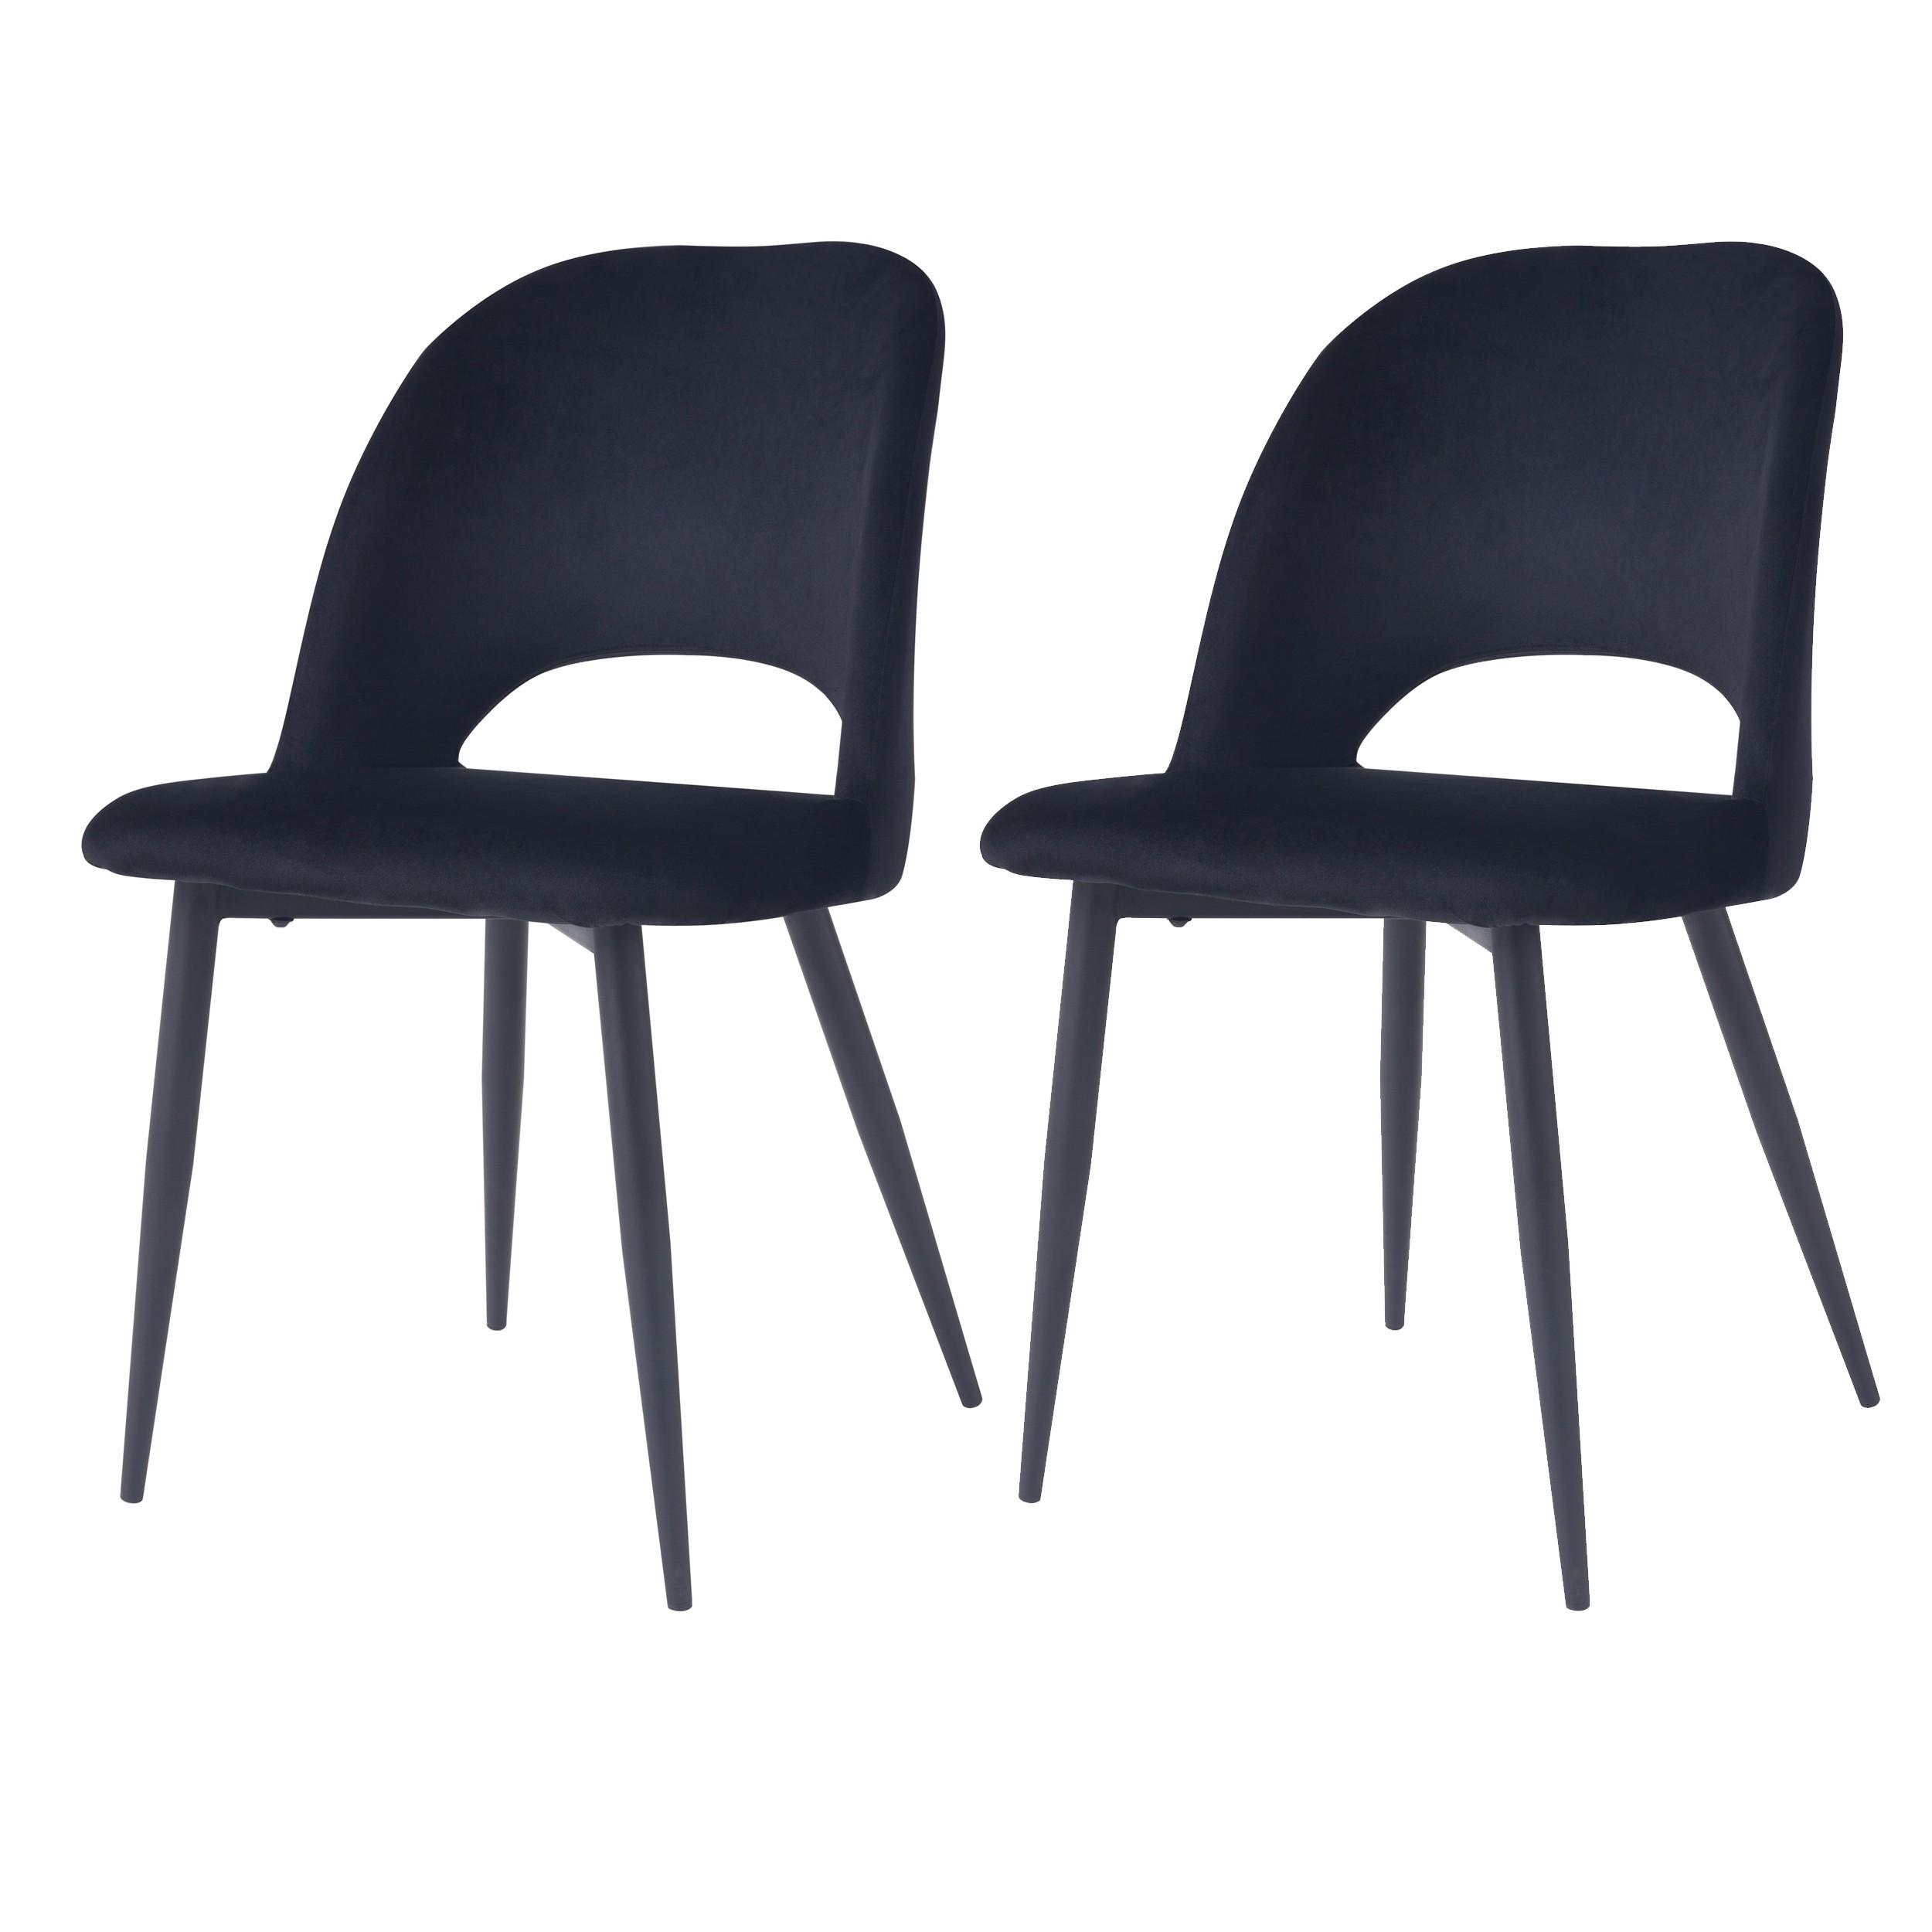 acheter chaise en velours noir pieds metal